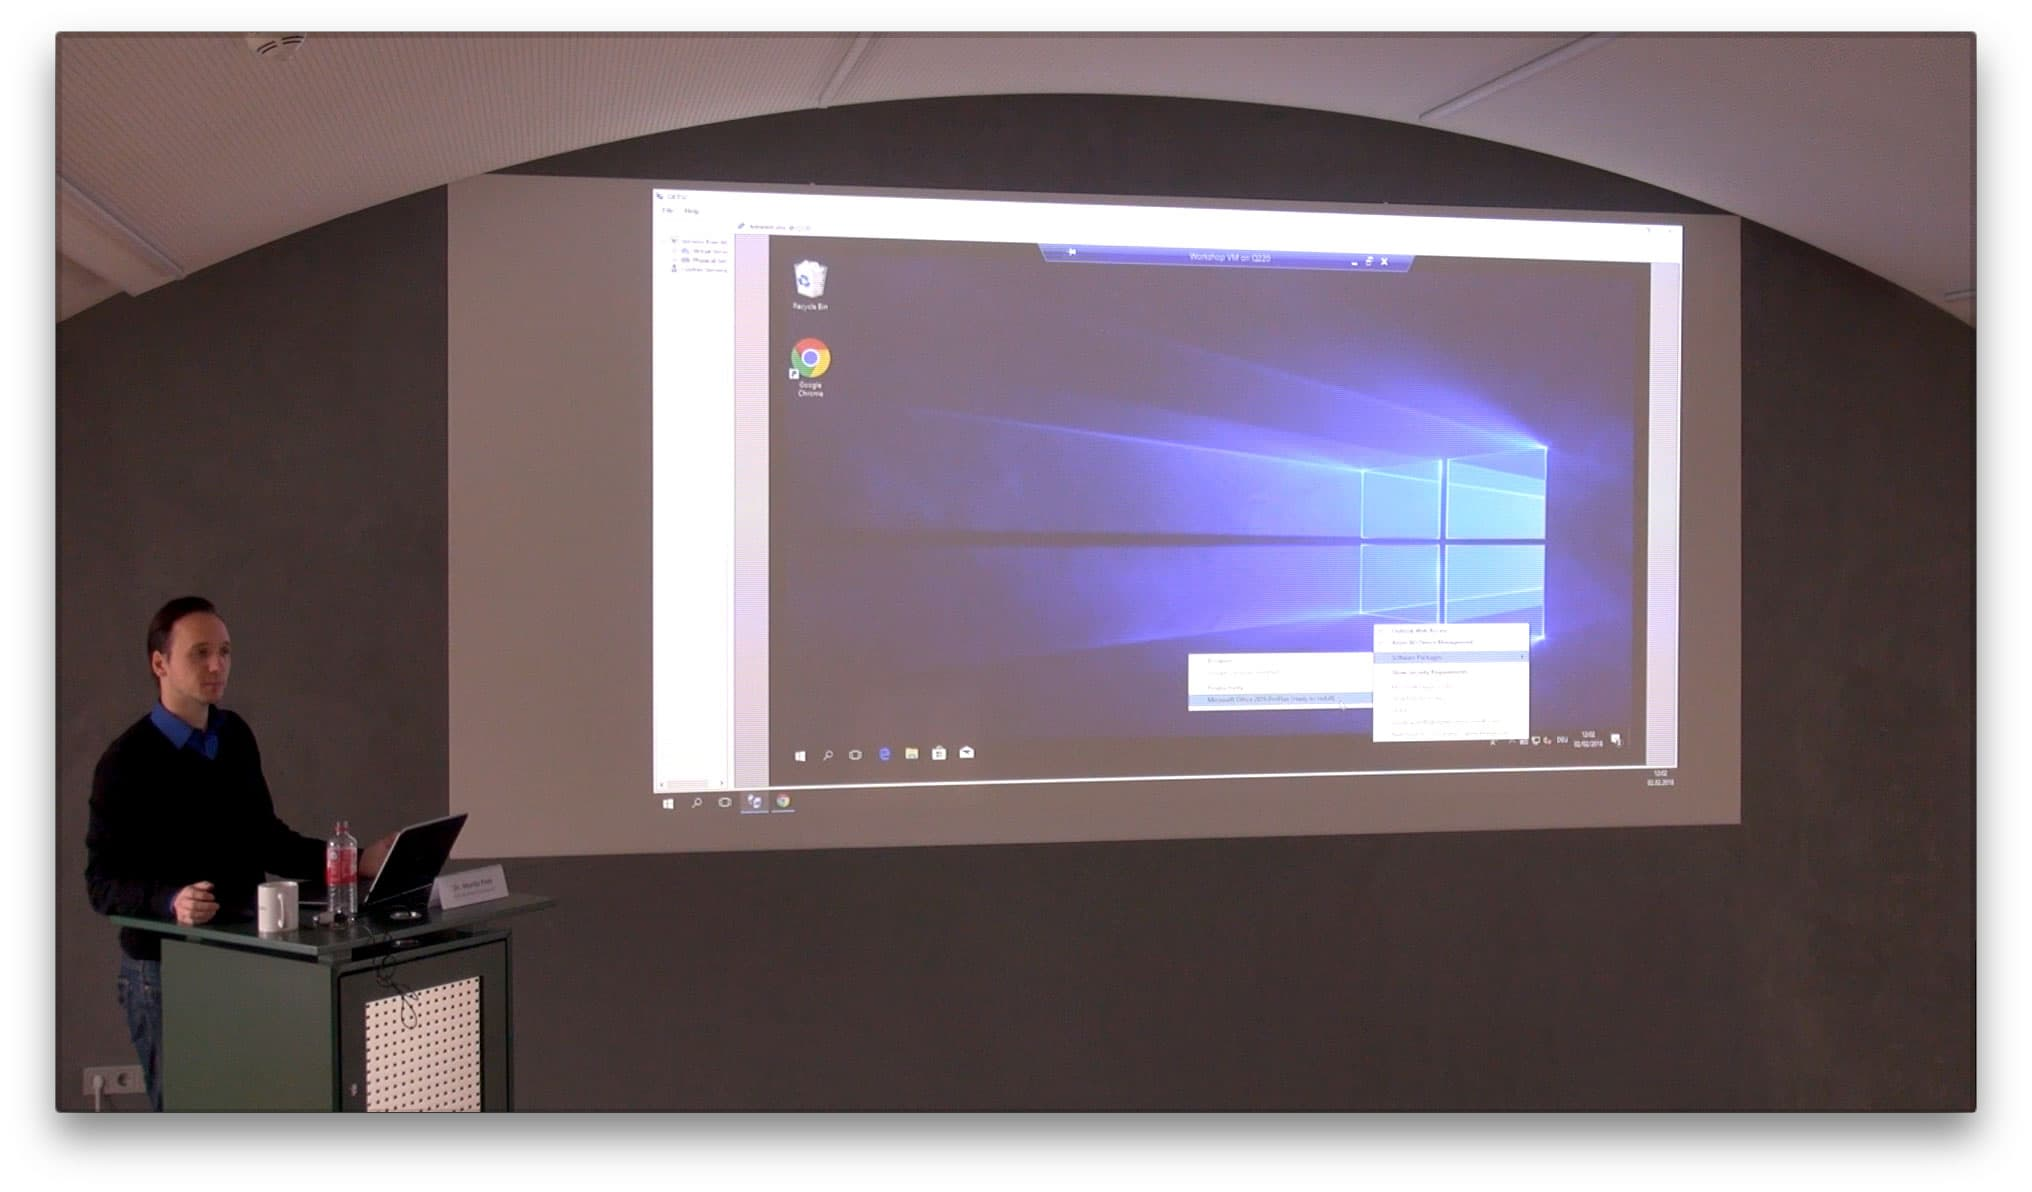 Training Windows Provisioning